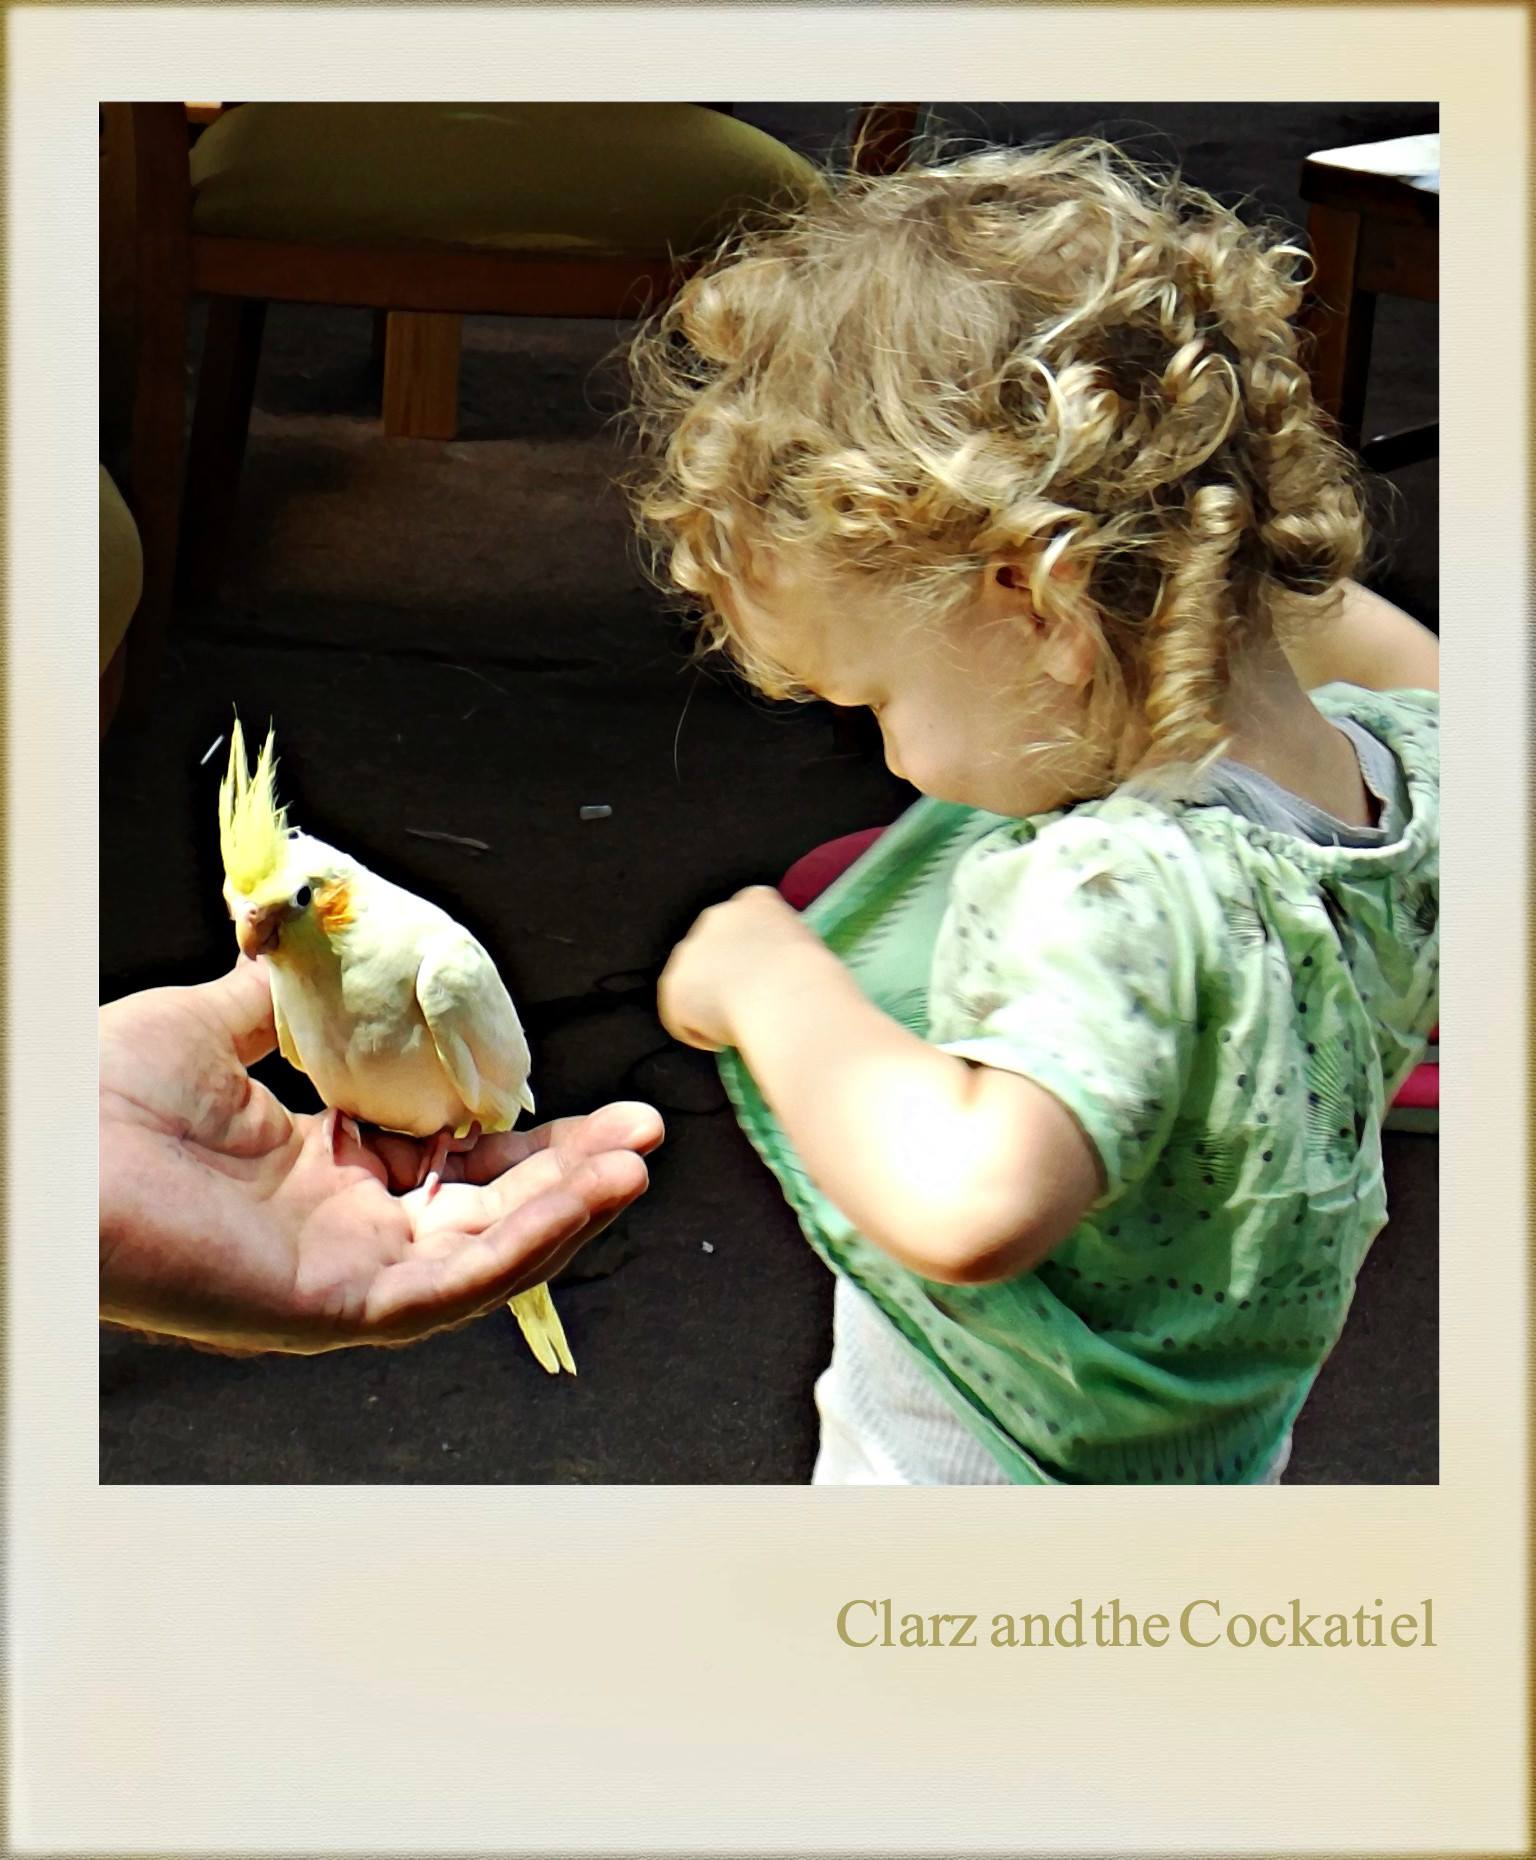 CLARA'S FIRST STORY